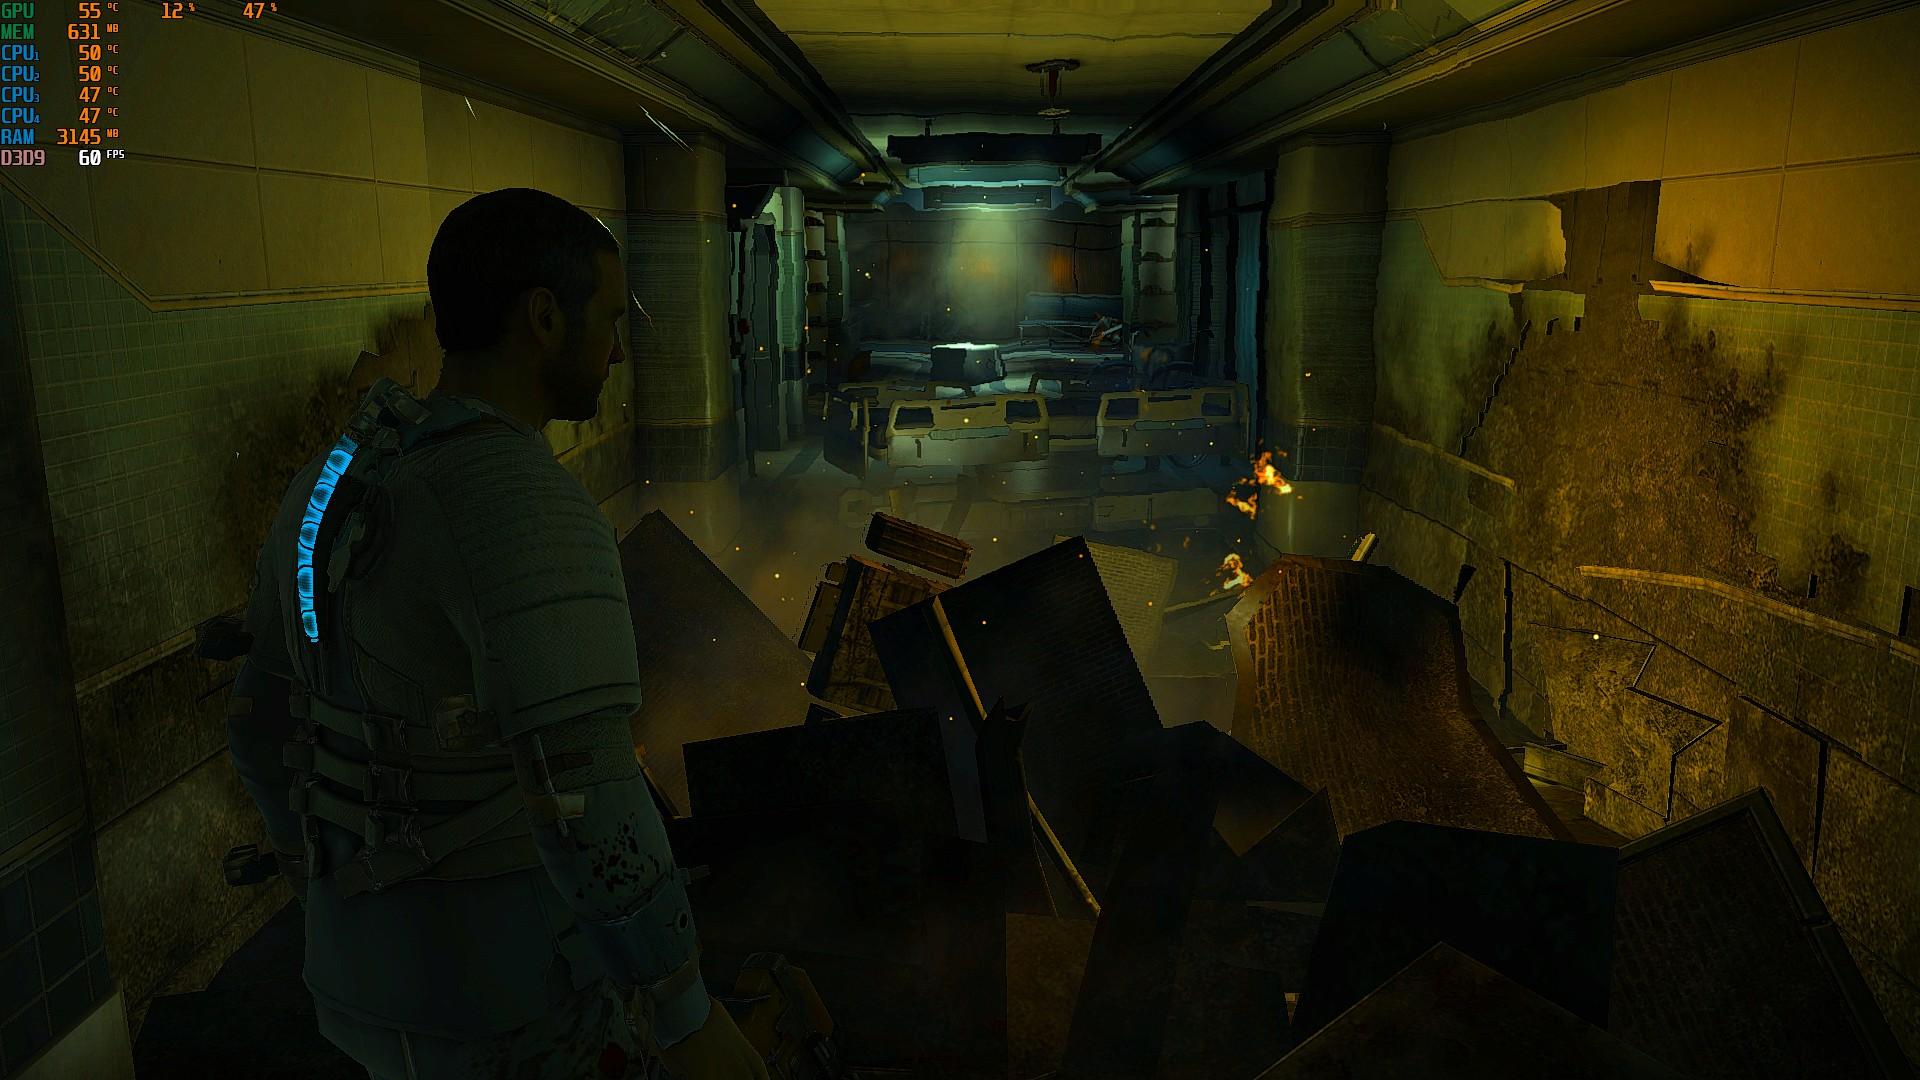 00038.Jpg - Dead Space 2